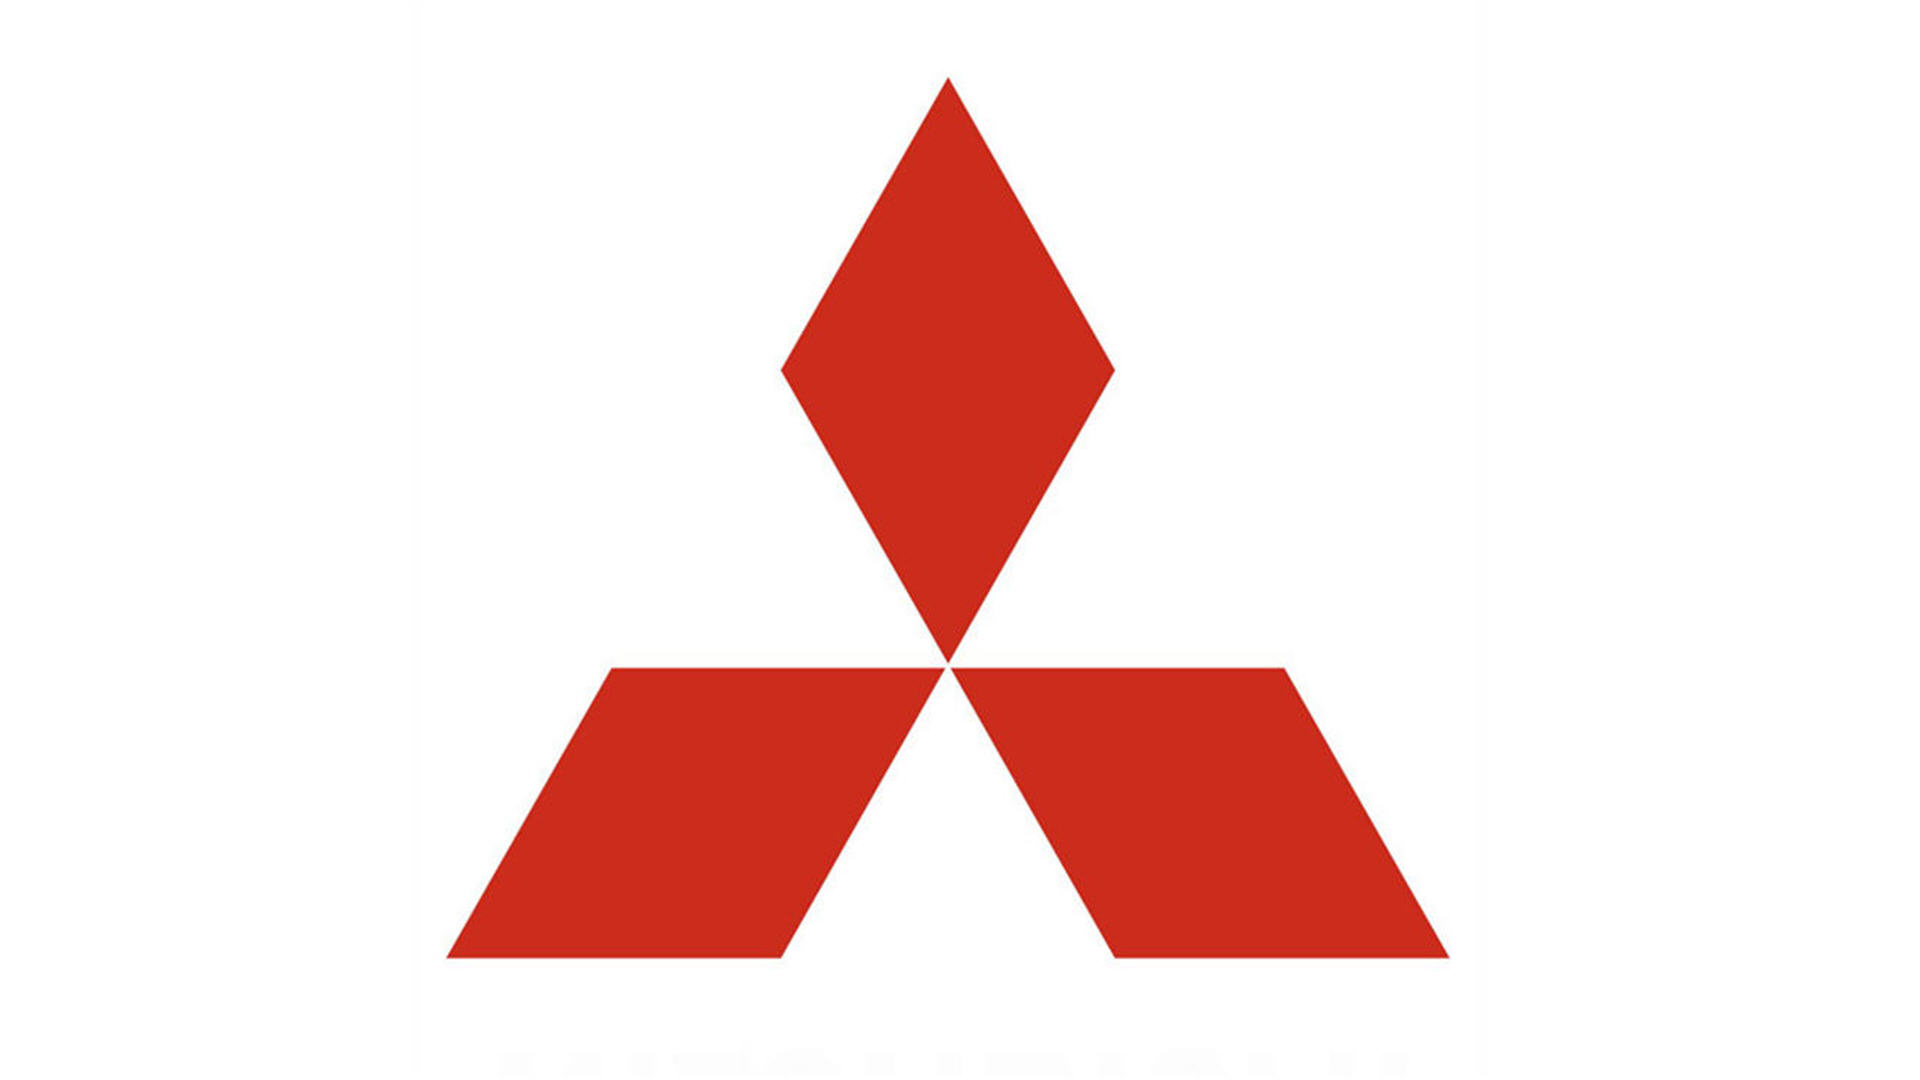 Mitsubishi LogoHD Wallpaper 1080p Car Wallpapers 1920x1080